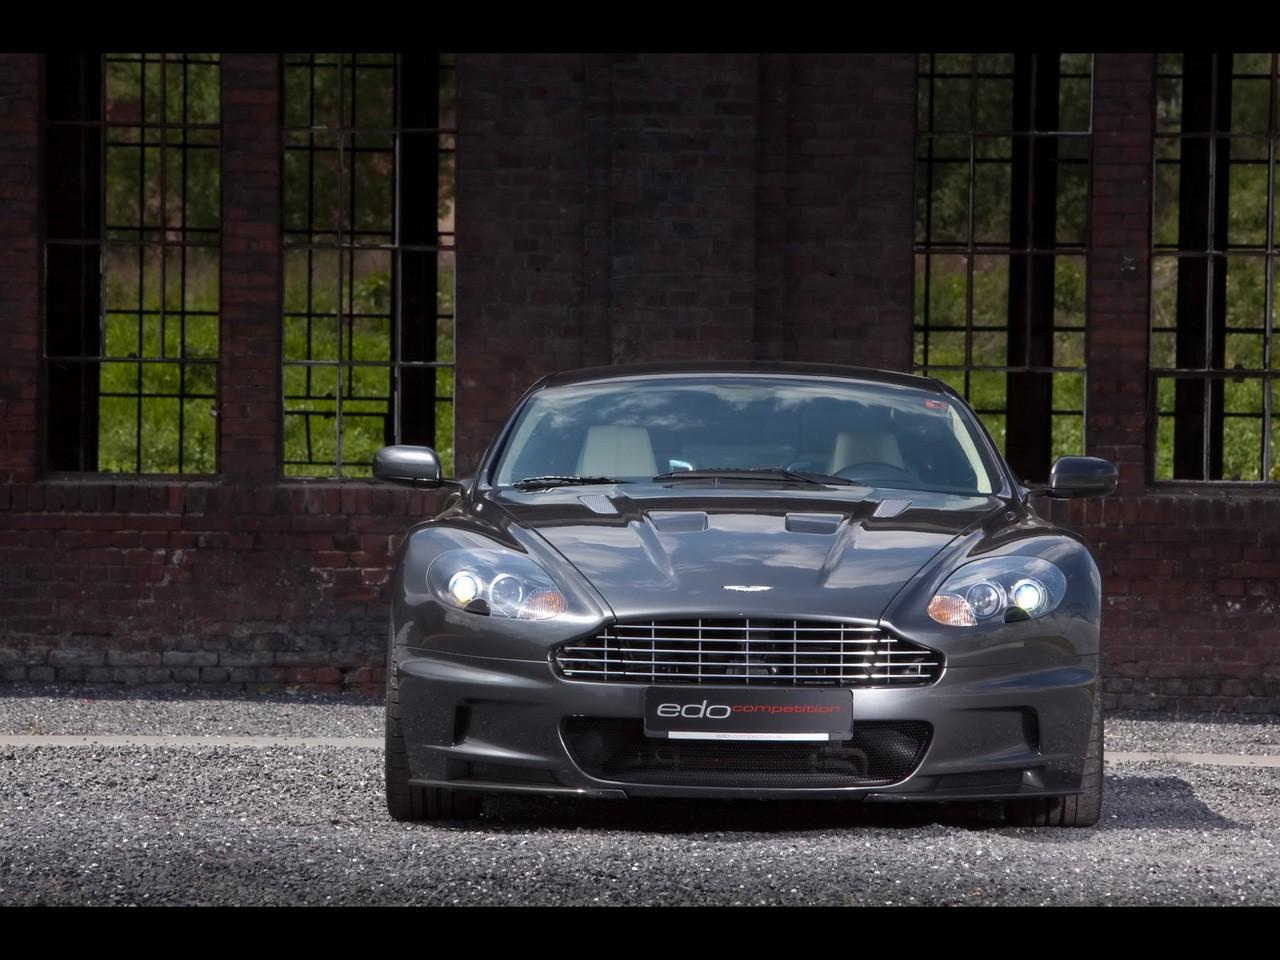 2010 Edo Competition - Aston Martin DB9 DBS Program